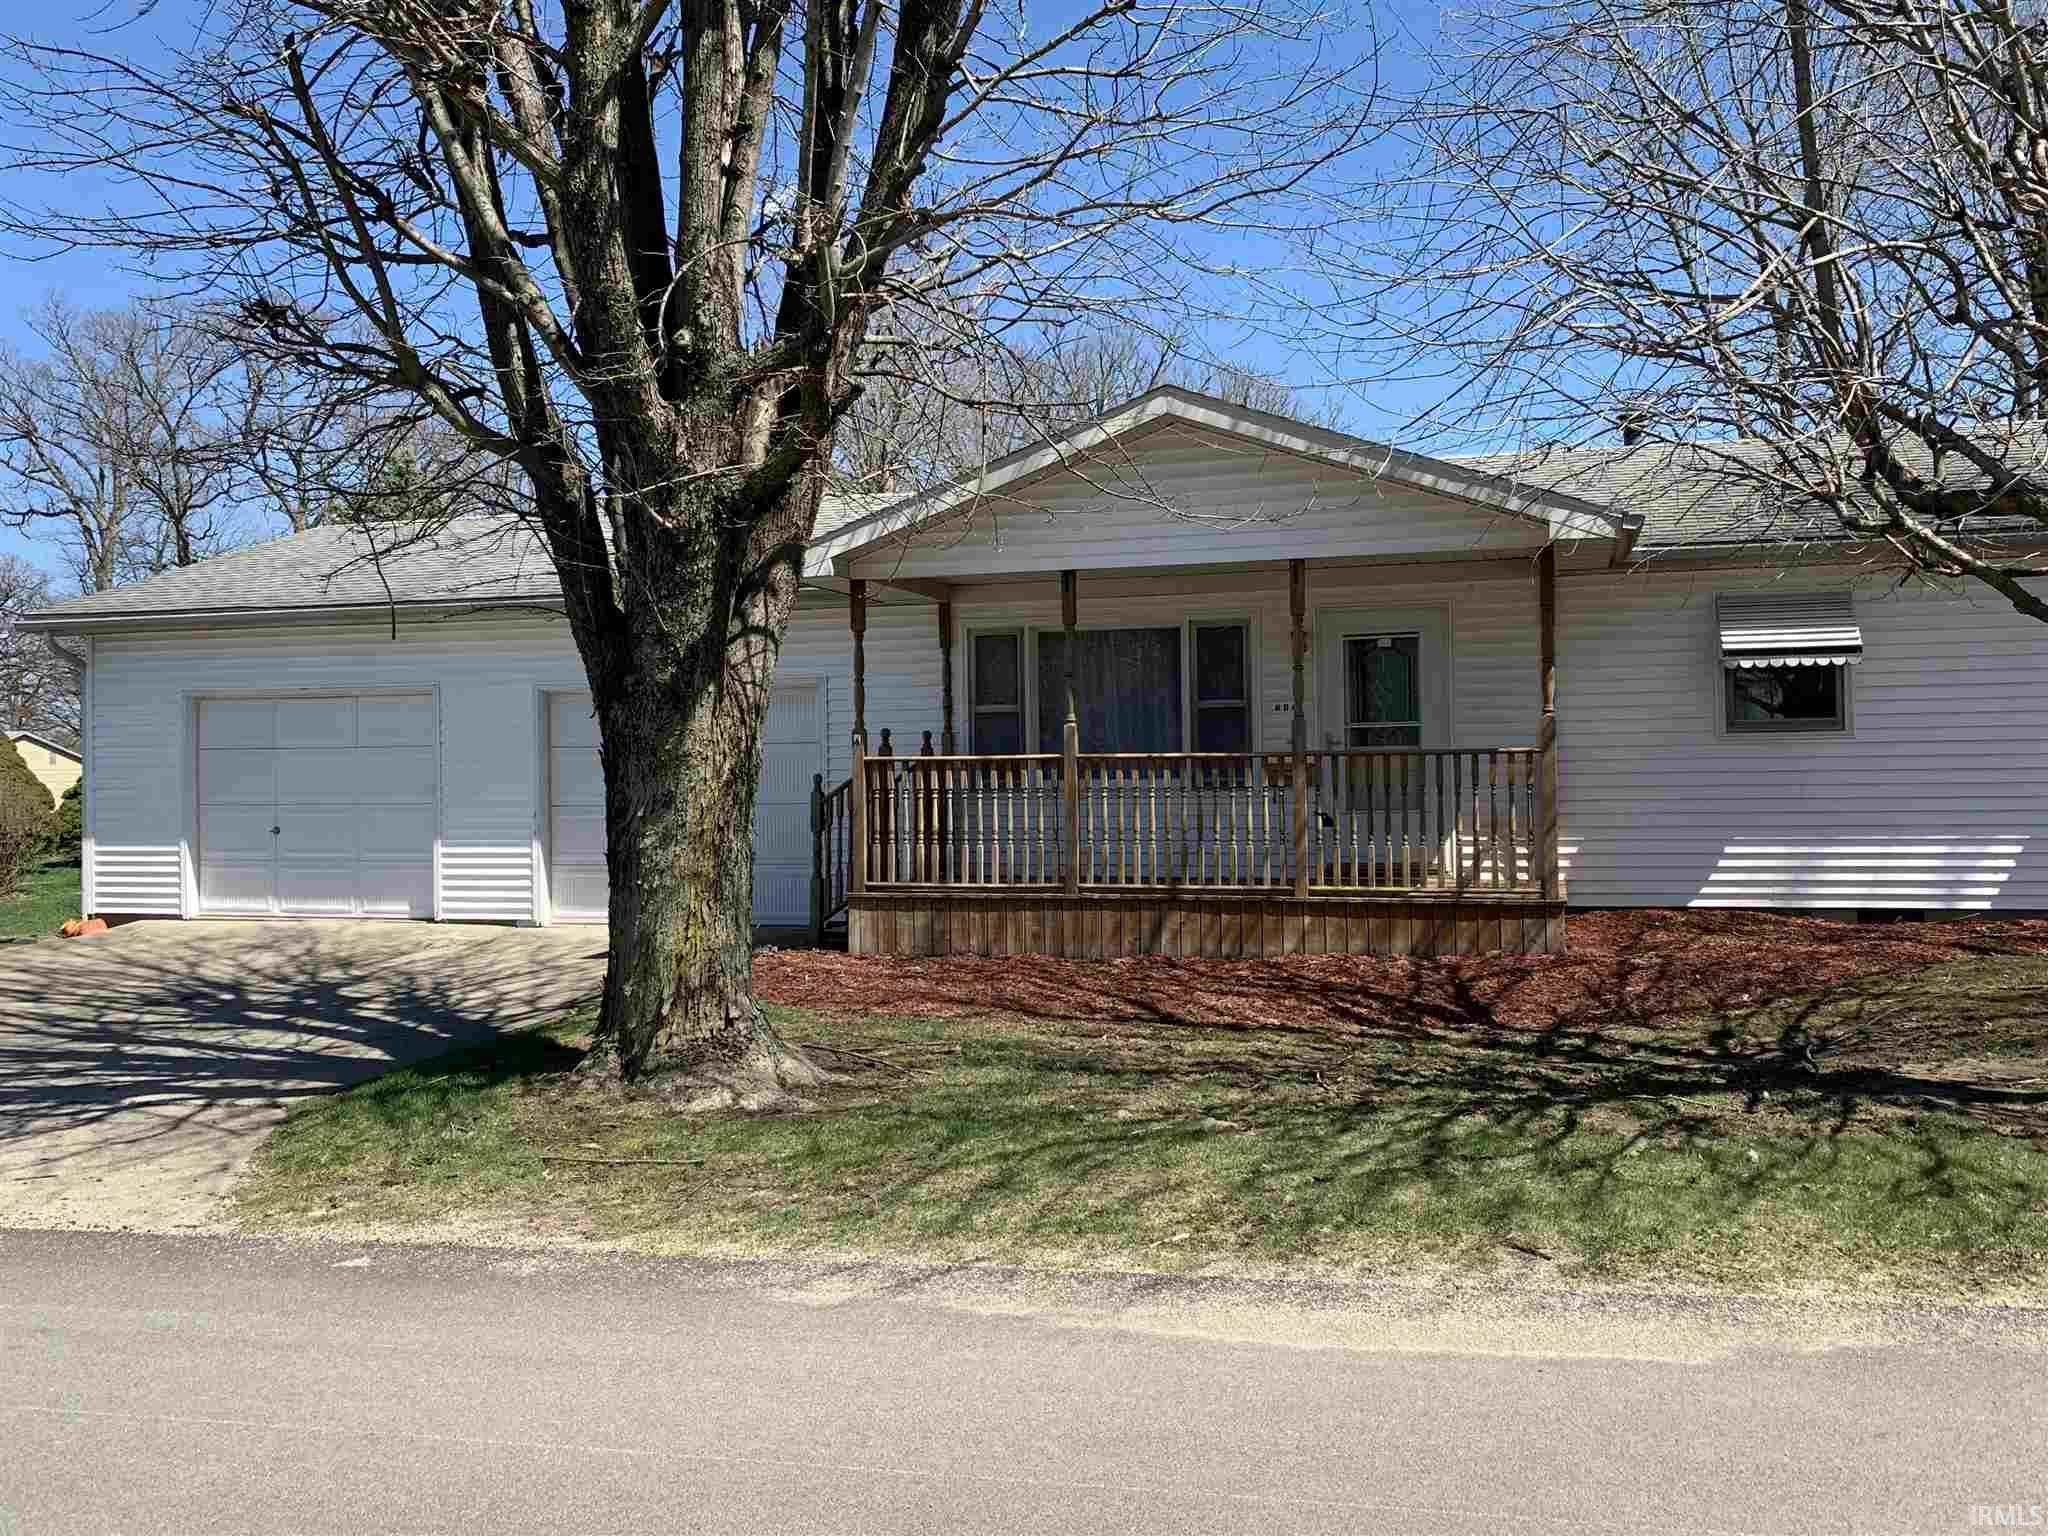 Terrific 311 Grant Street Williamsport 47993 Sold Listing Carpenter Realtors Inc Home Interior And Landscaping Synyenasavecom